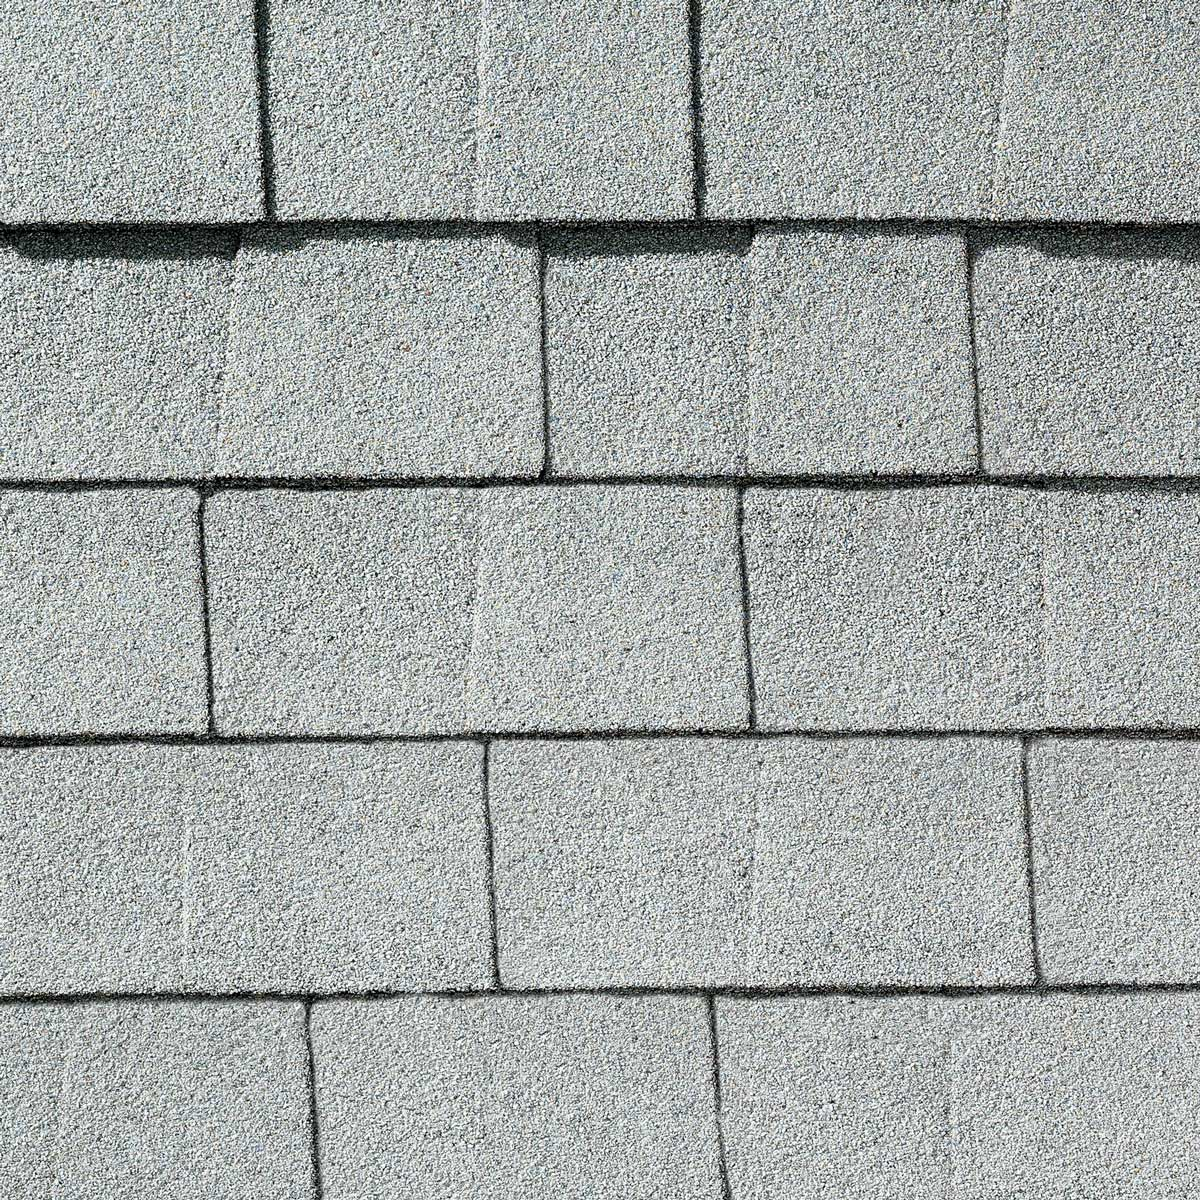 Gaf Timberline Hd Shingles Ed Senez Roofing Specialist Llc